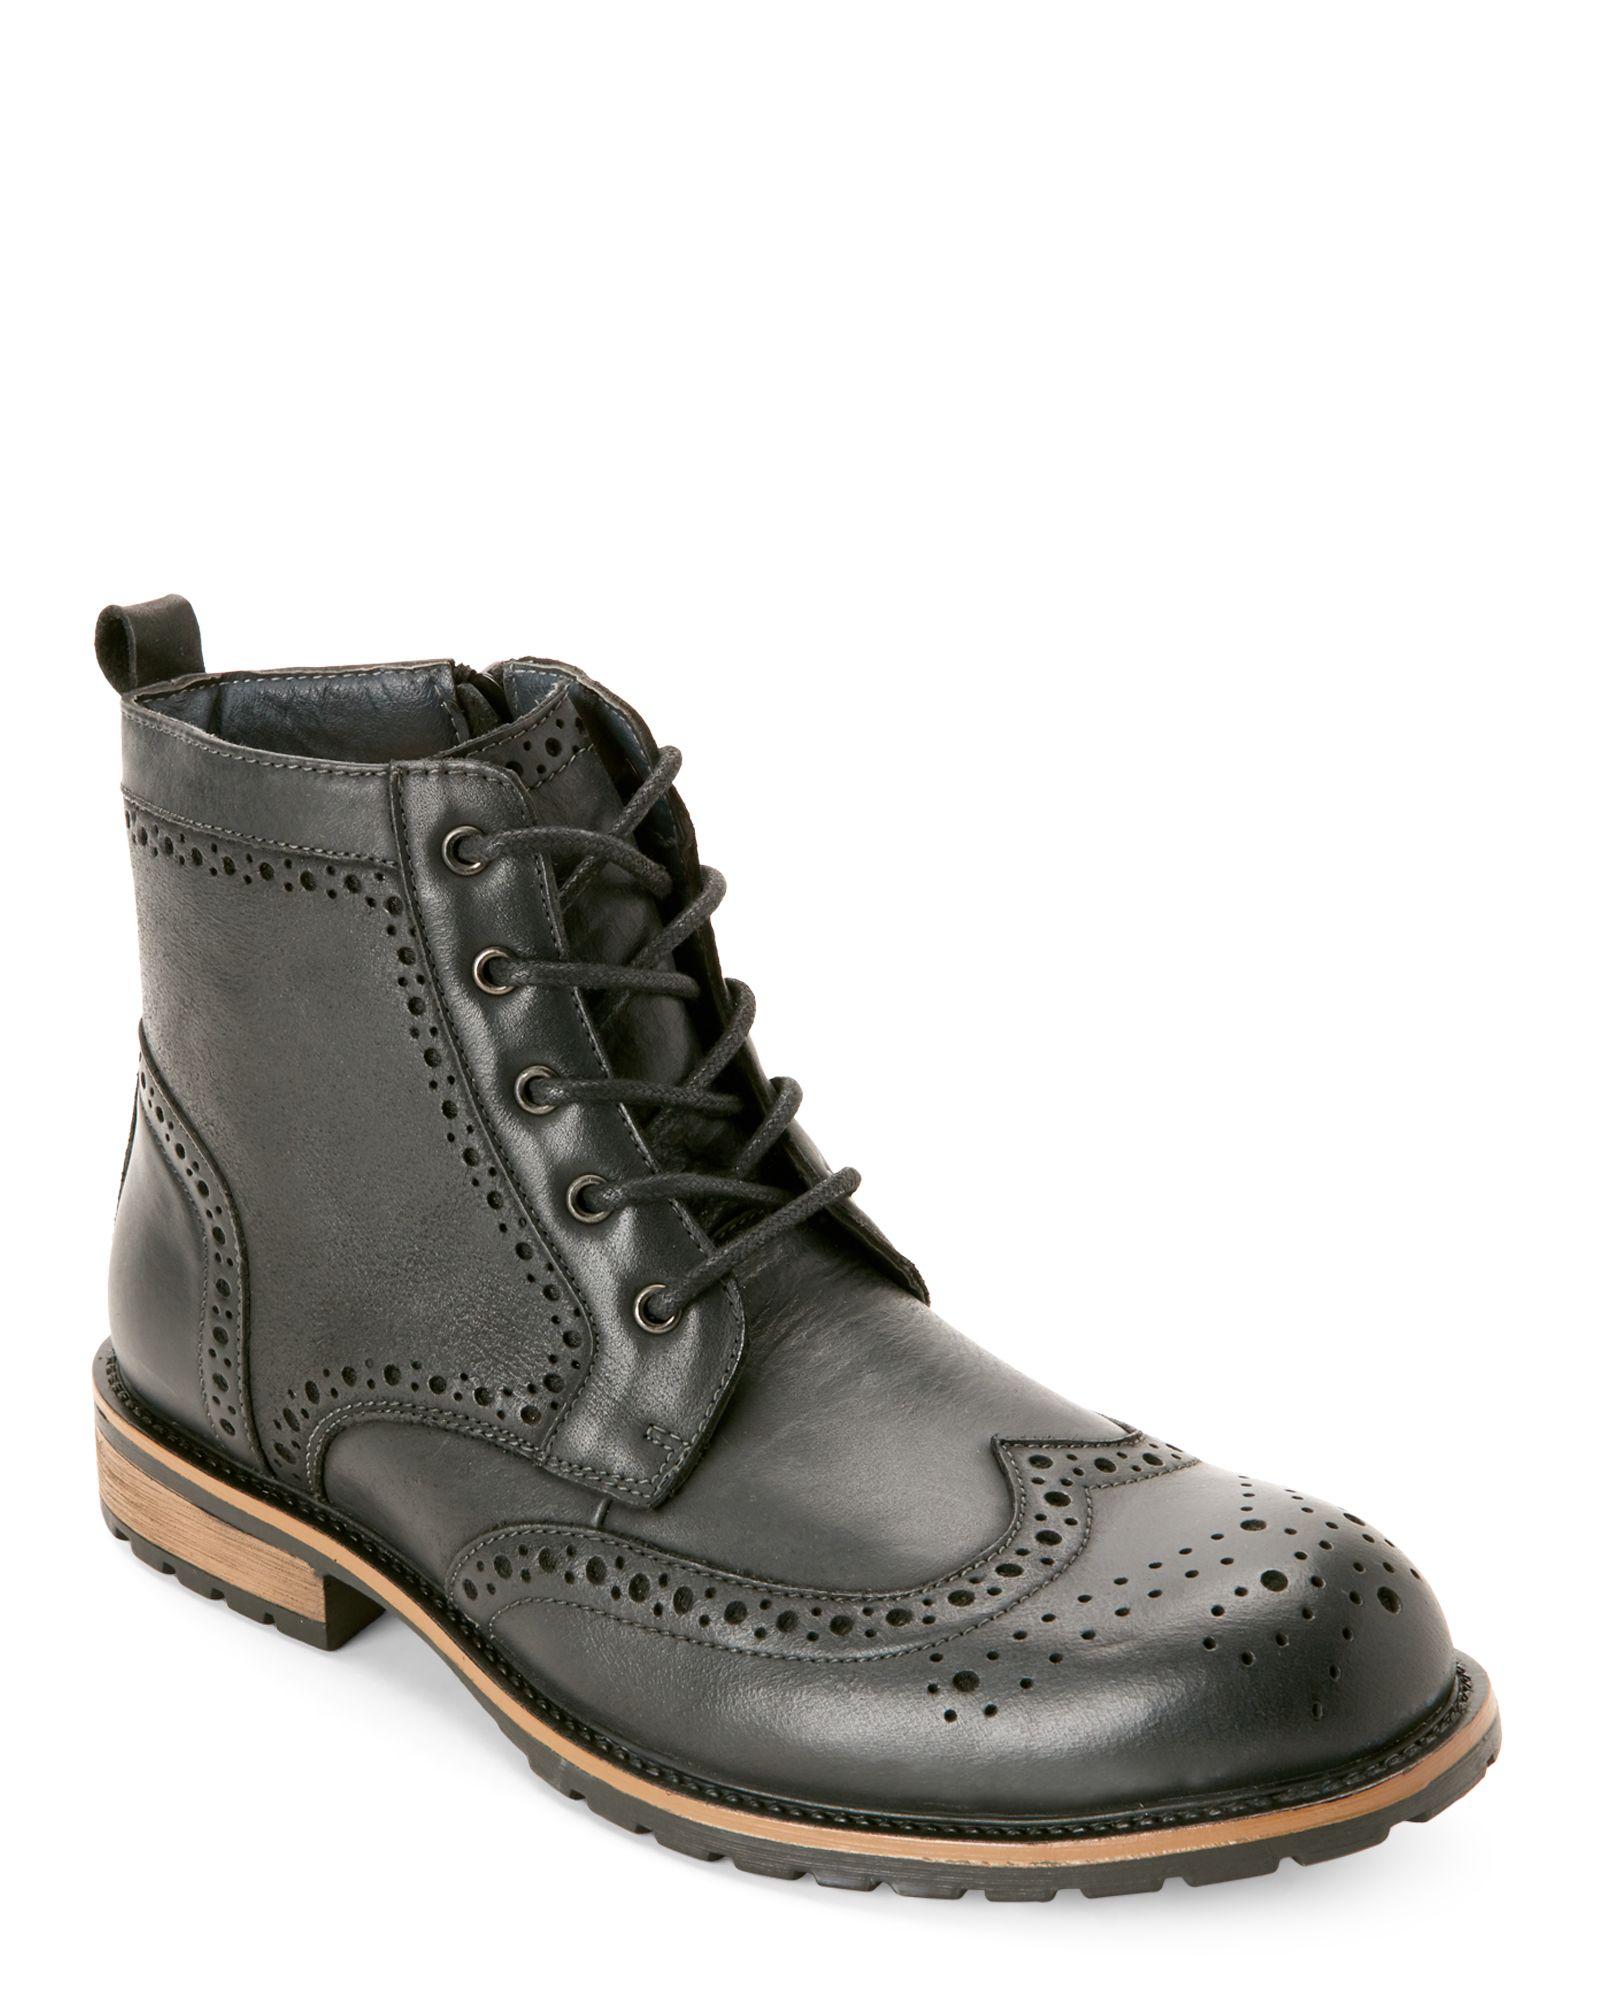 6a0b49dbcff Black Sprocket Brogue Wingtip Boots | *Apparel & Accessories ...